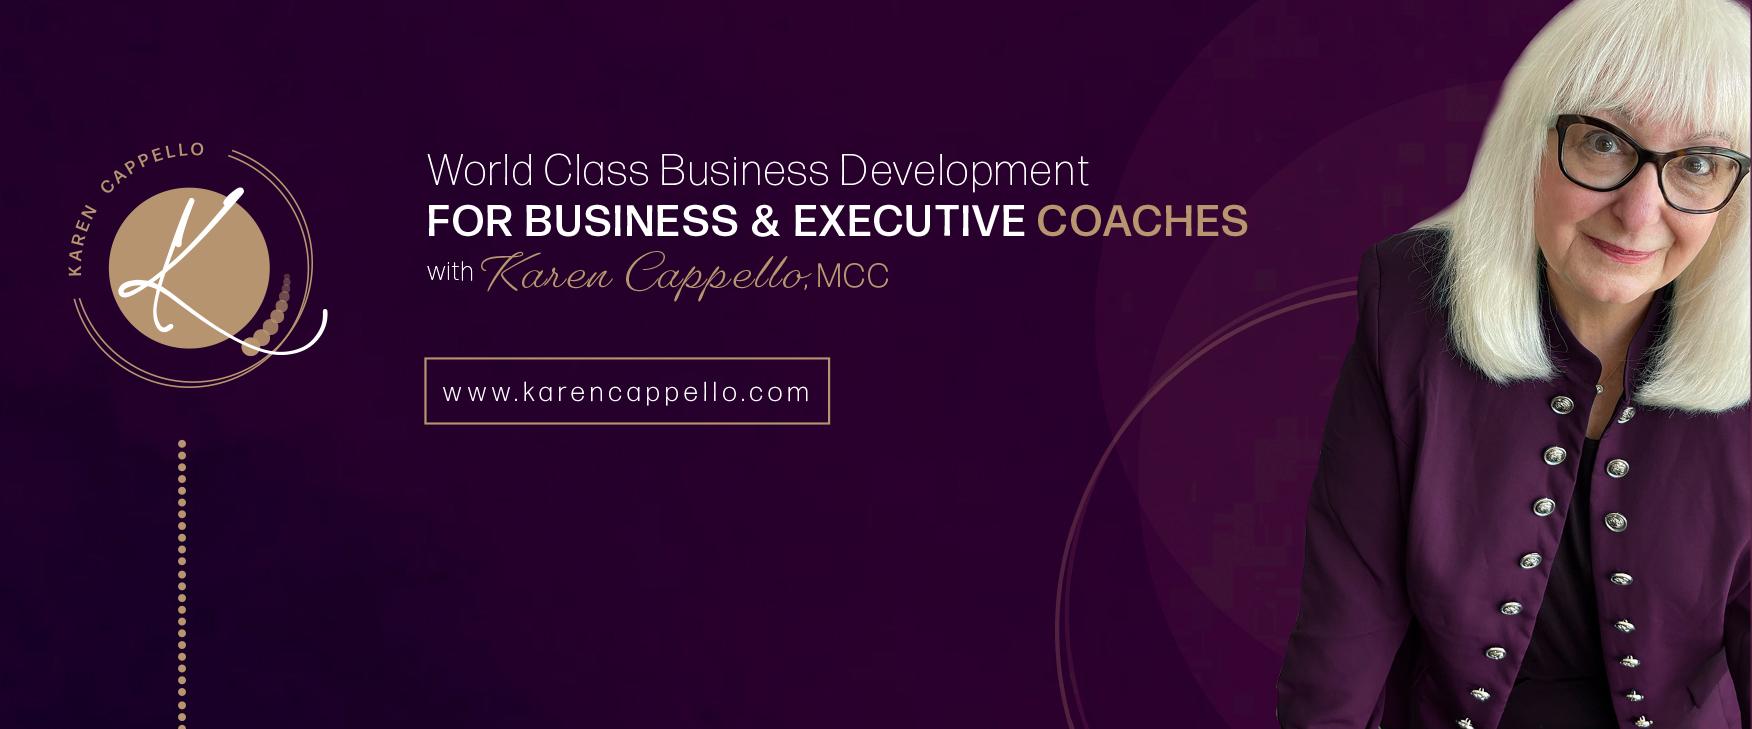 World Class Business Development for Business & Executive coaches with Karen Cappello, MCC